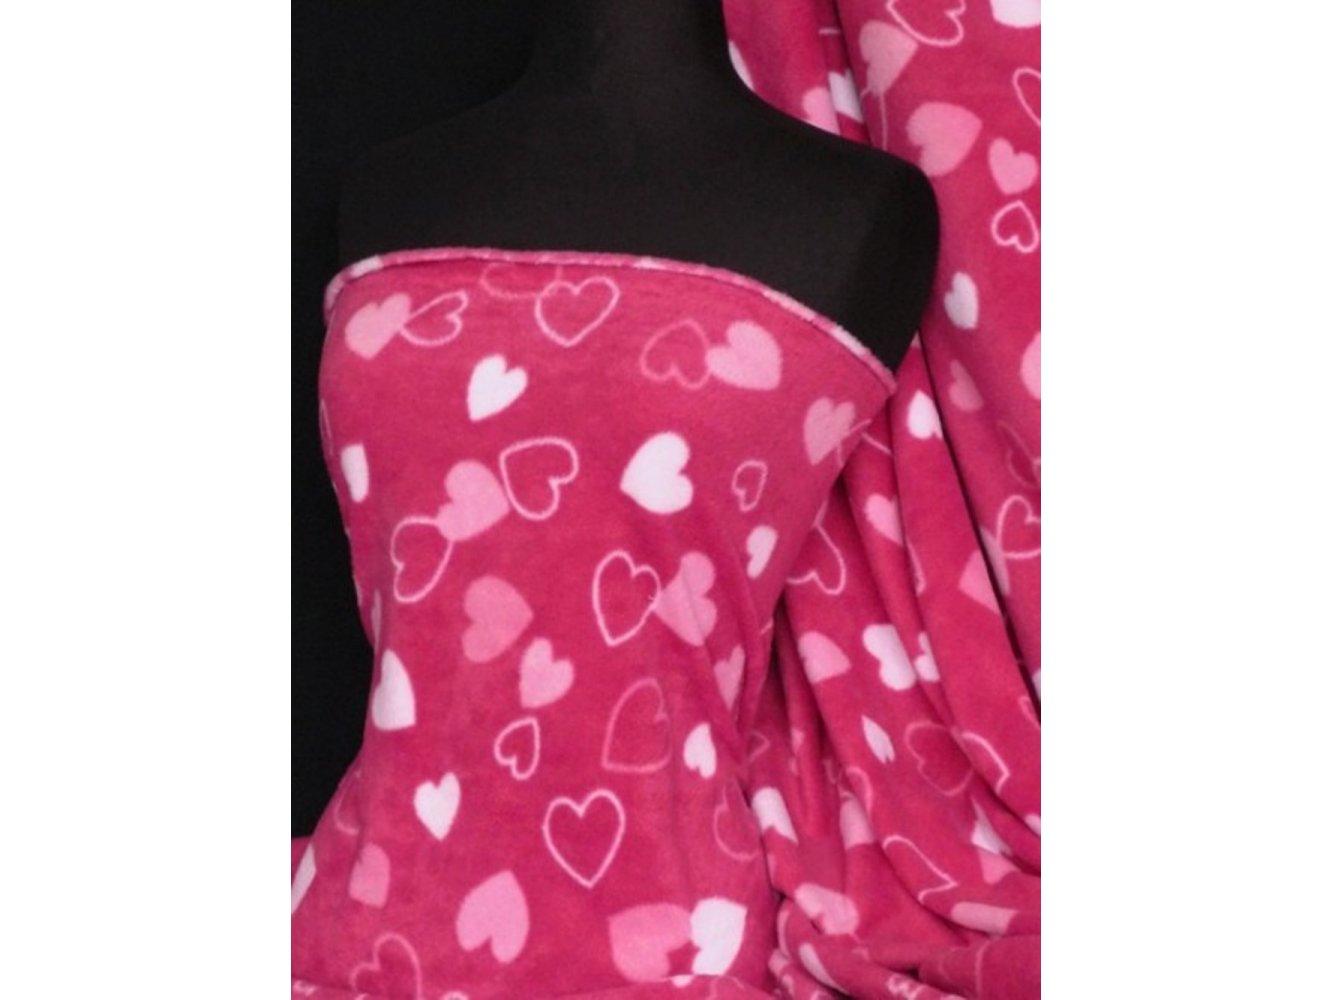 Polar Fleece Anti Pill Washable Soft Fabric- Cerise Pink